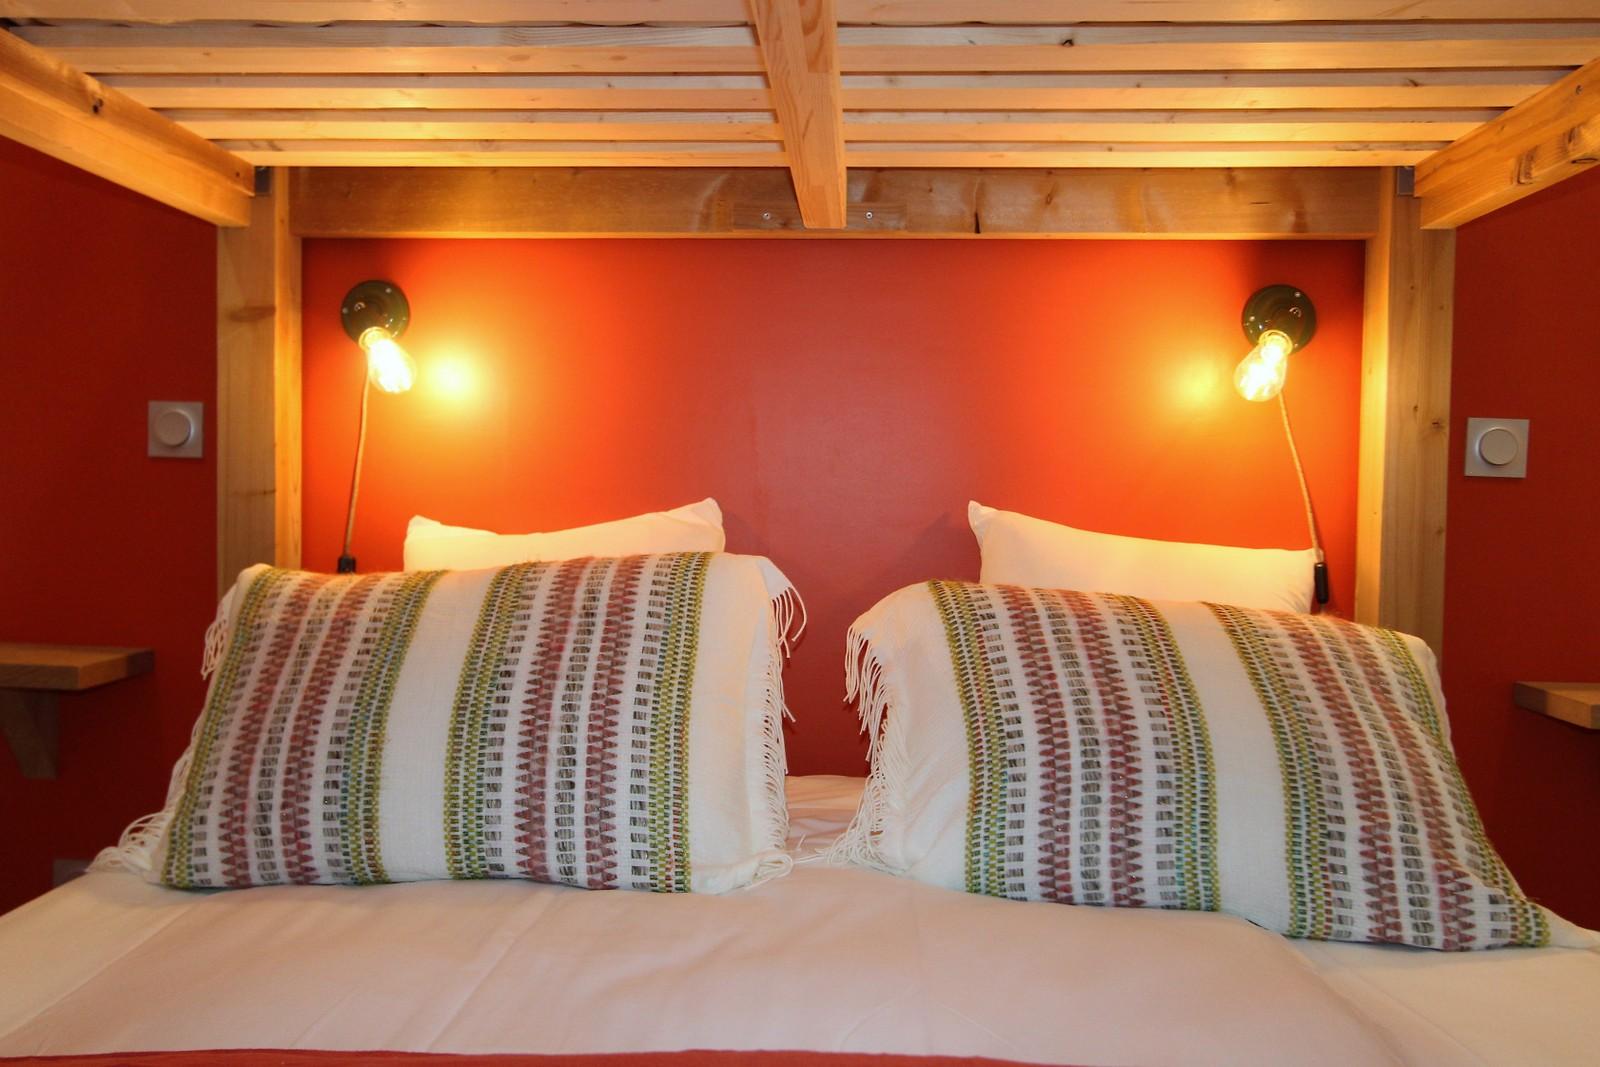 dortoir 4 lits refuge montagne les 2 alpes enfants confortable